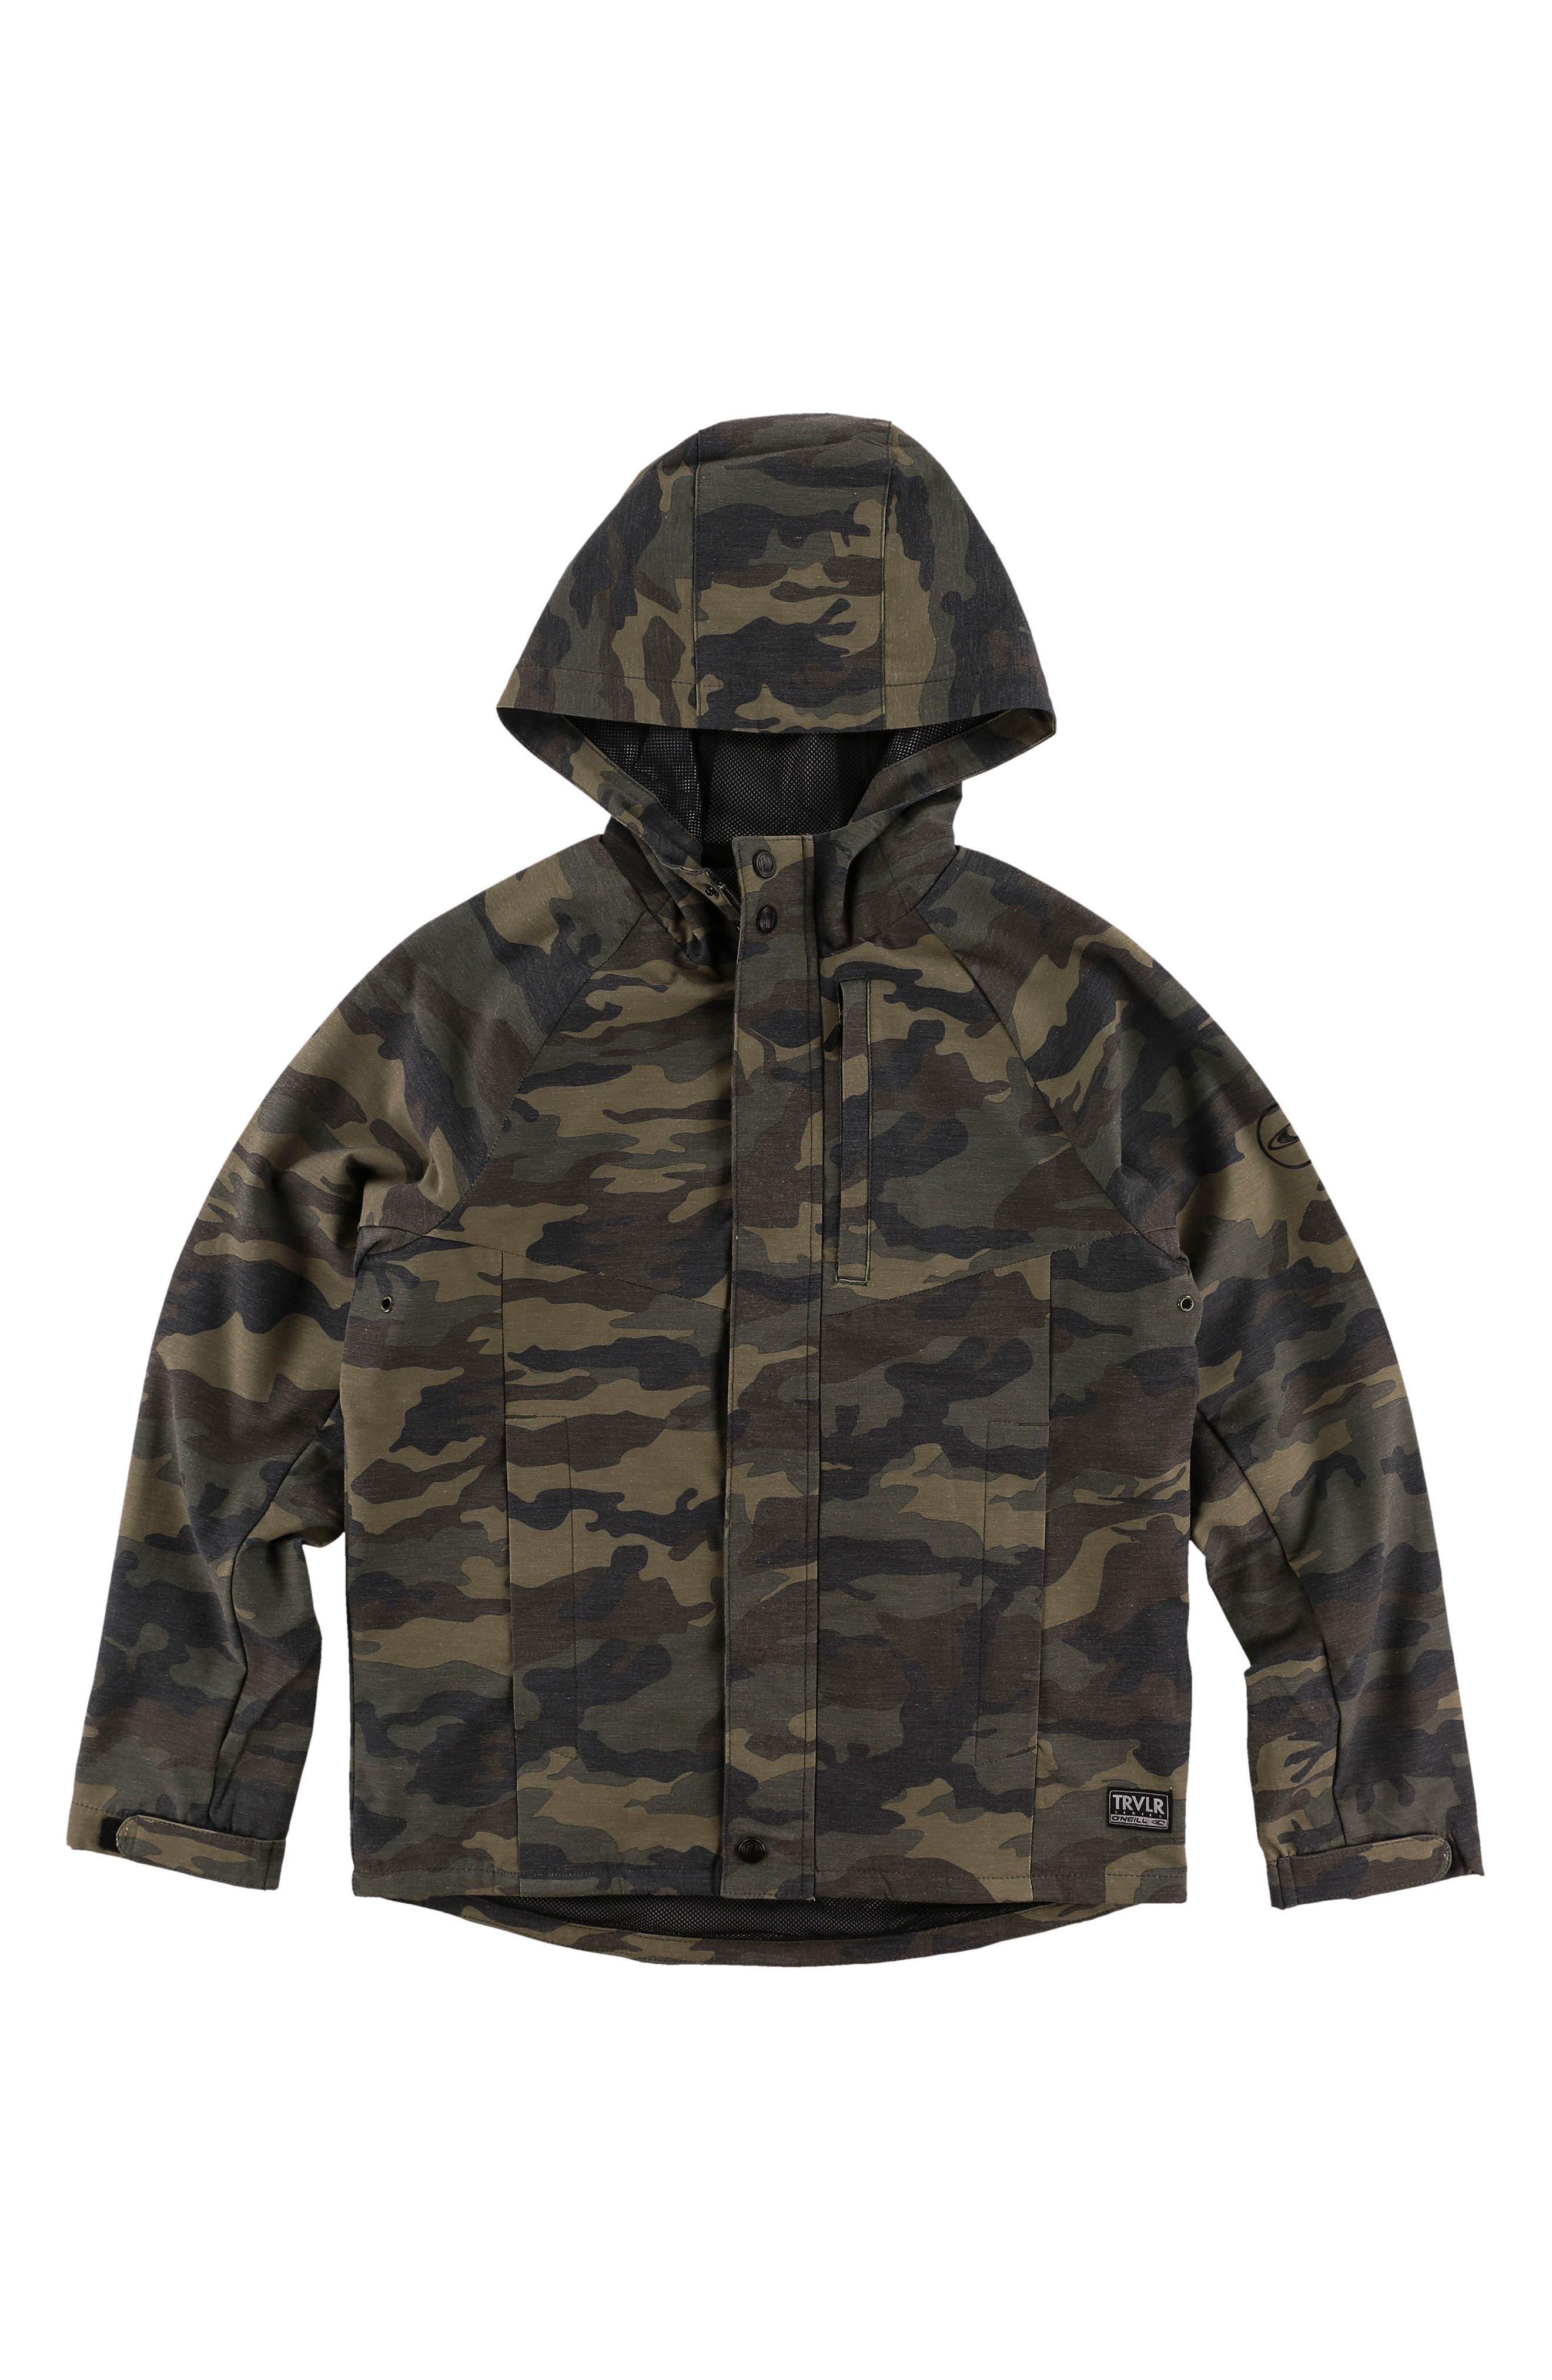 Traveler Dawn Patrol Camo Hooded Windbreaker Jacket,                         Main,                         color, 310